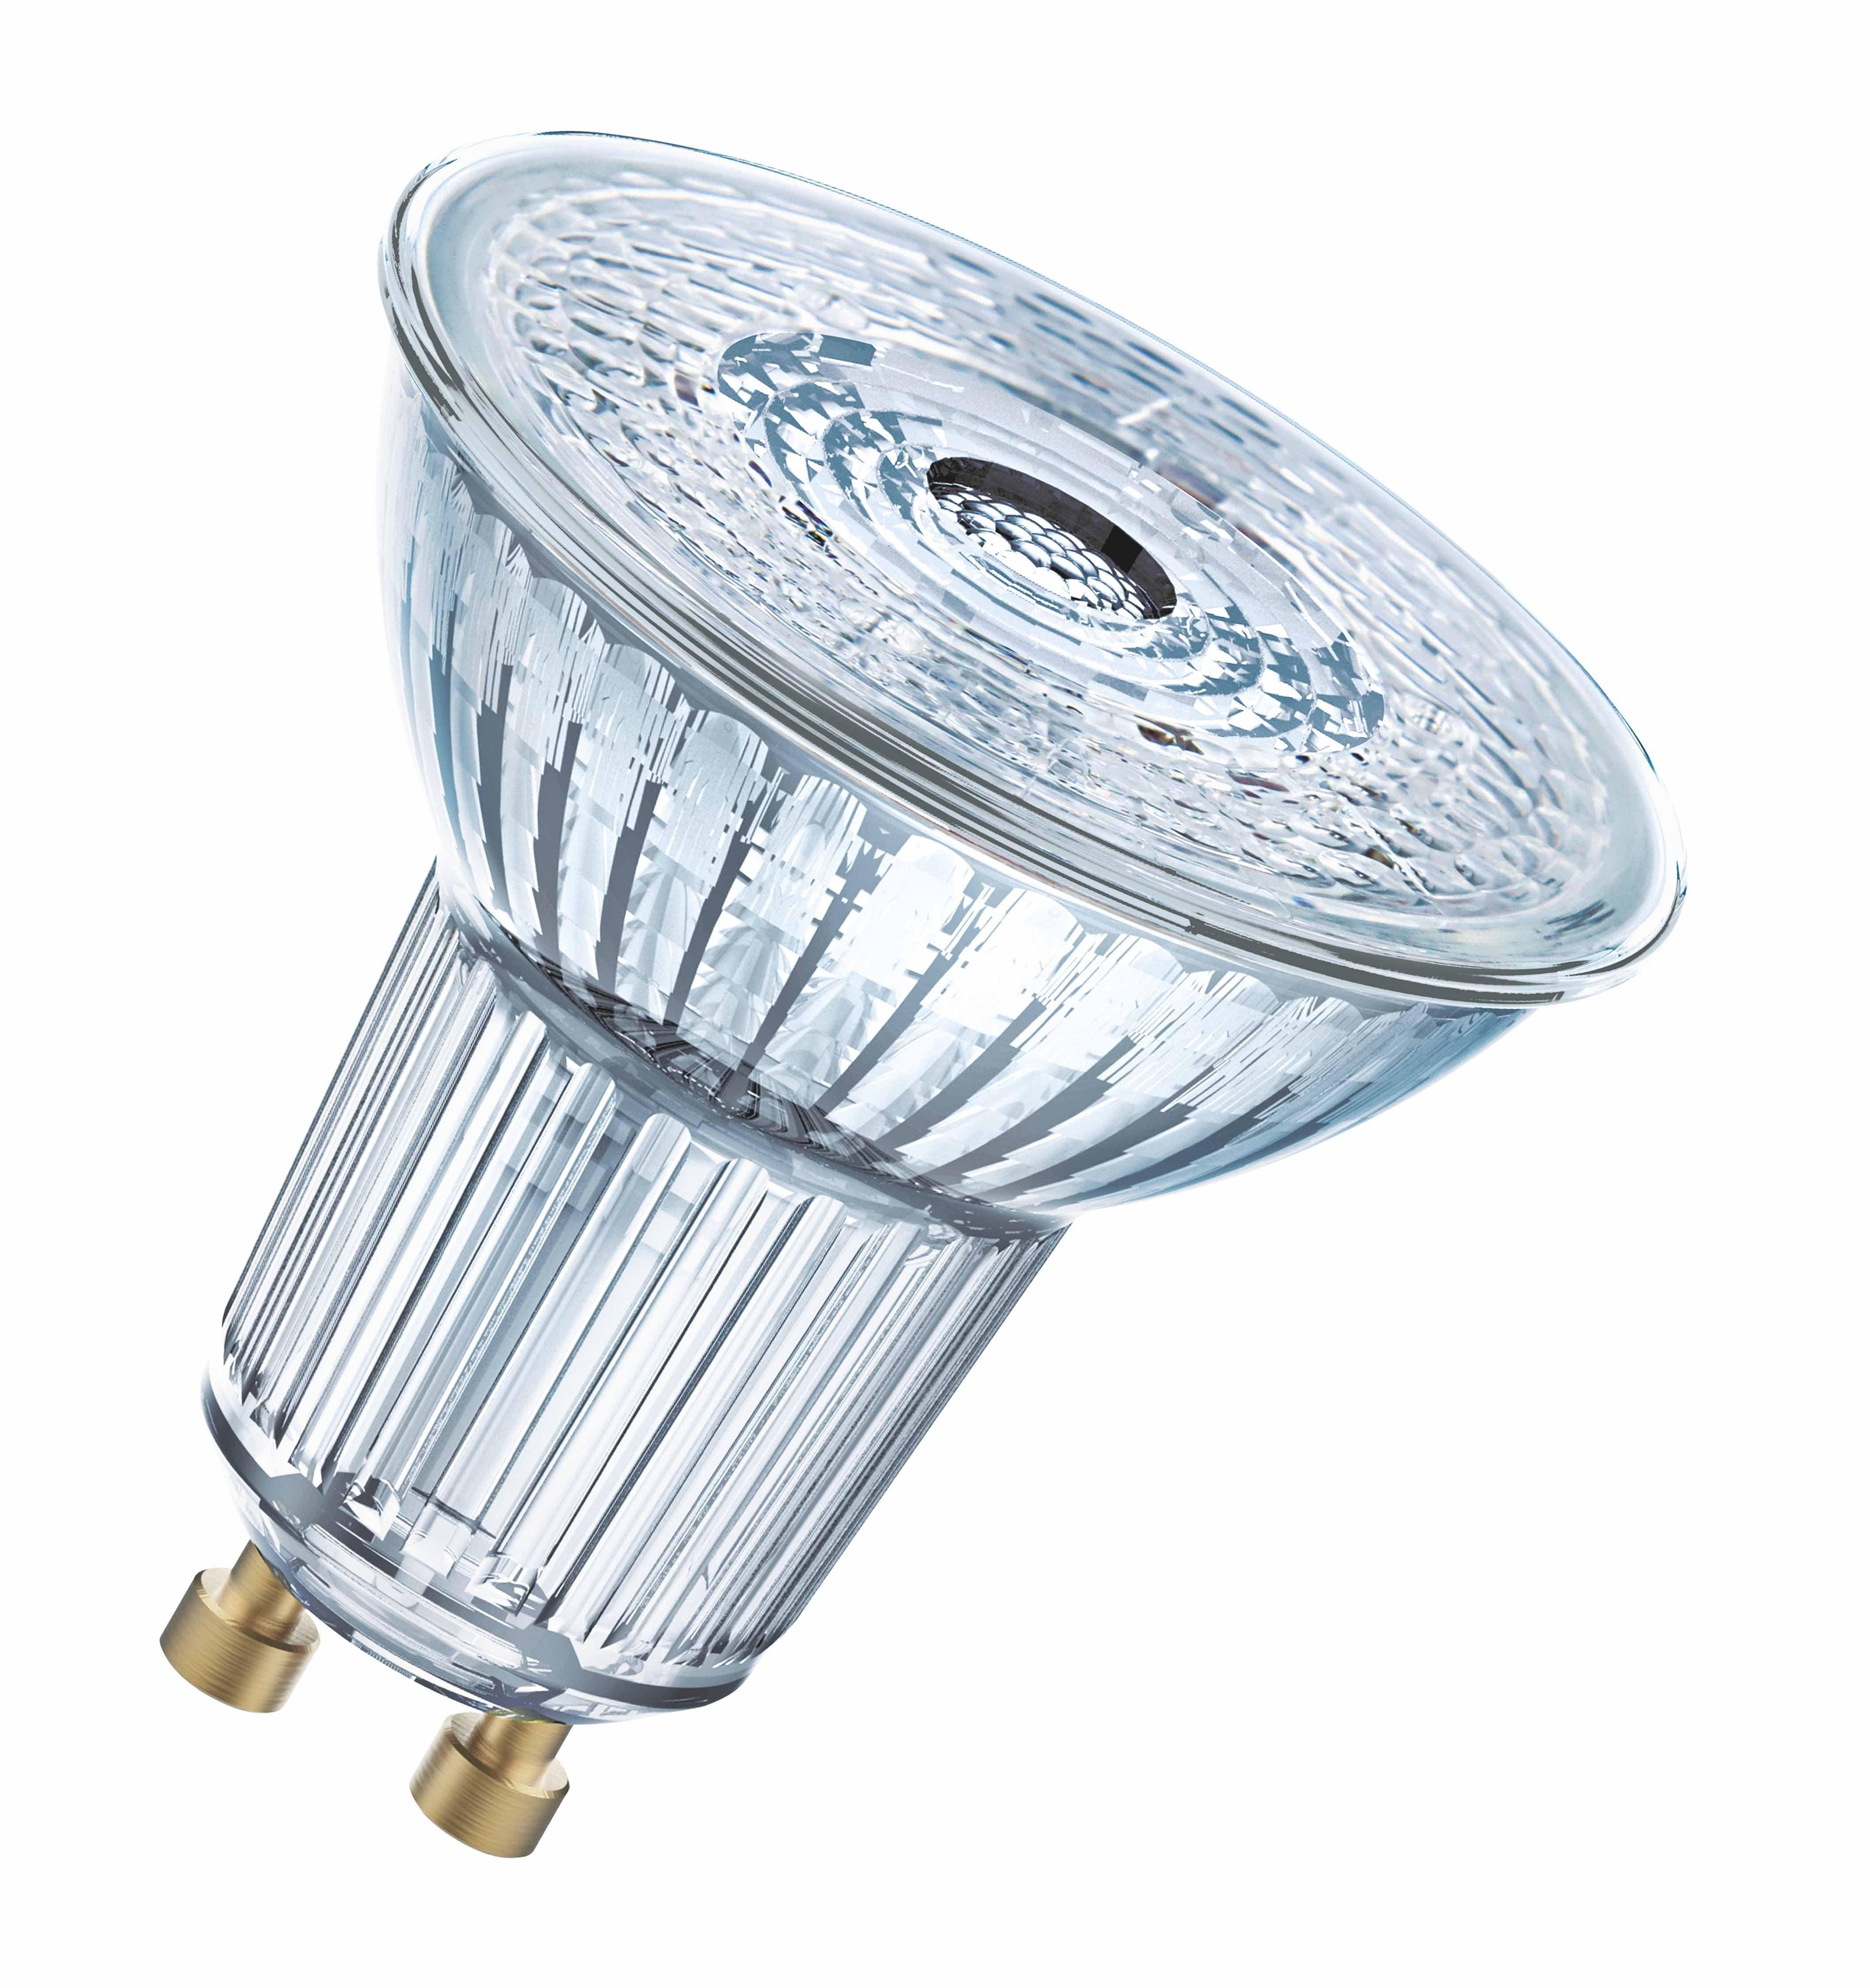 LED SUPERSTAR PAR16 - Dimmbare LED-Lampe, Retrofit-Stecksockel »SST PAR16 7.2W/827 GU10«